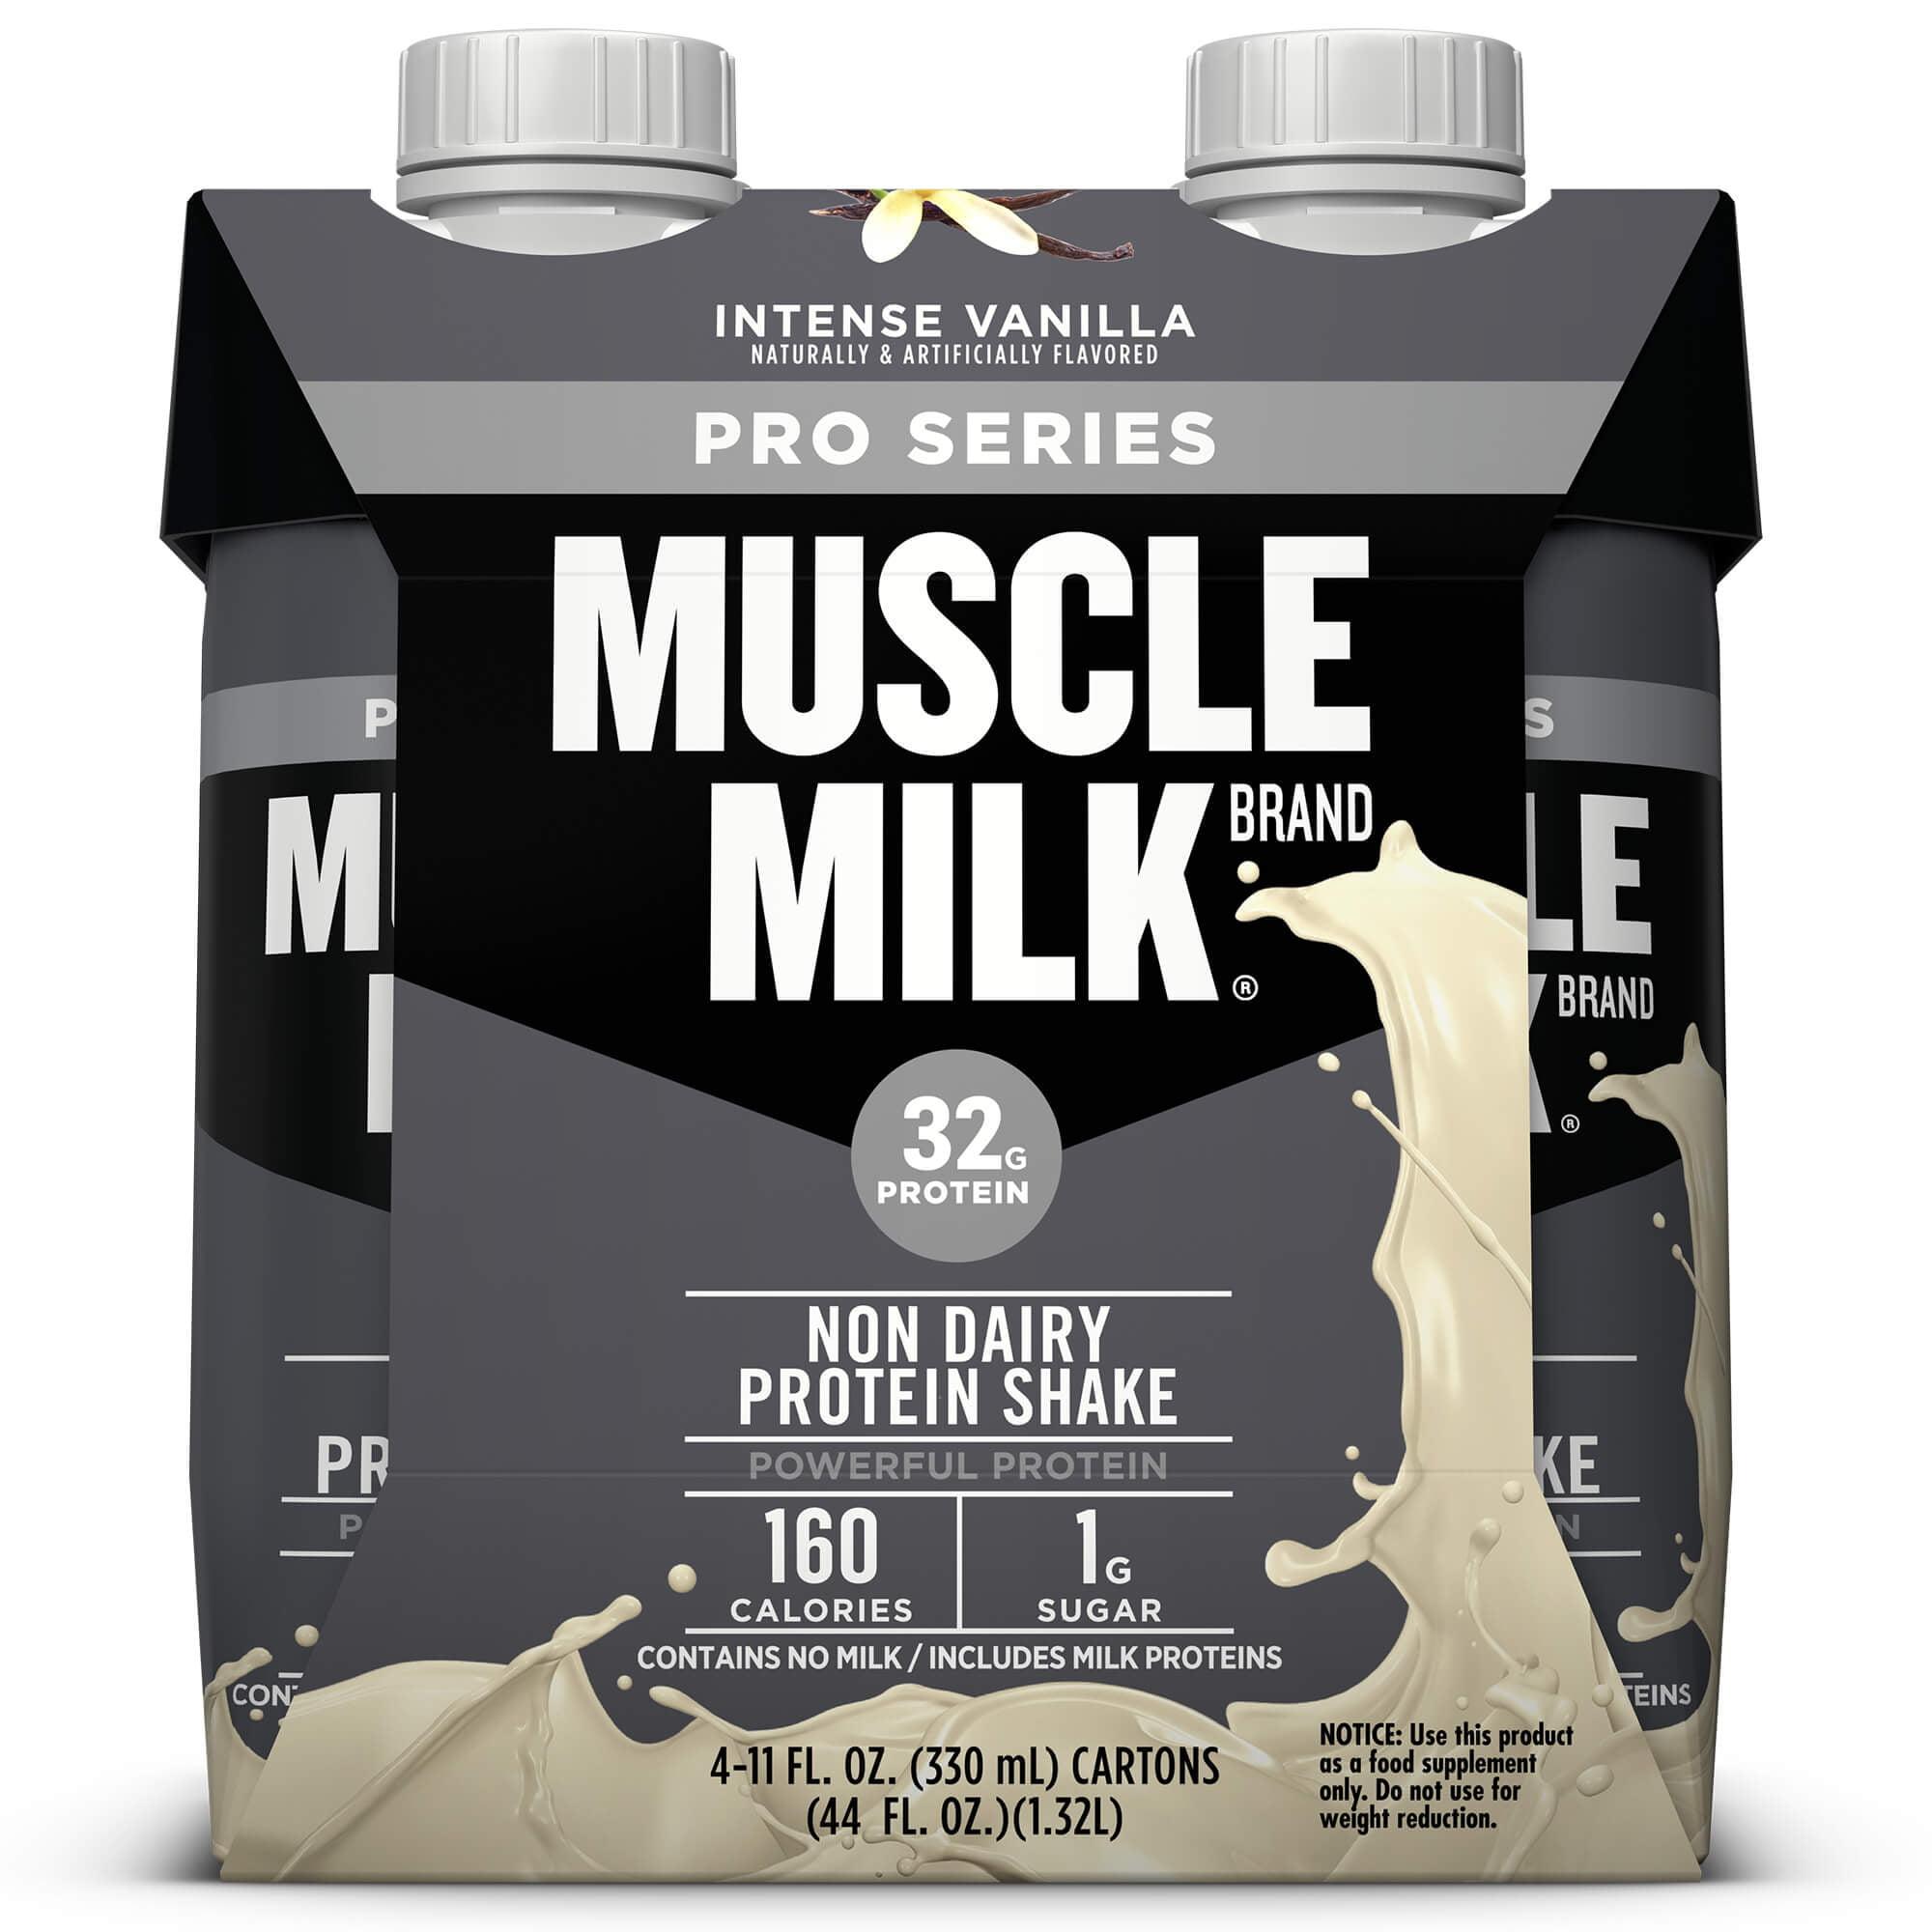 Muscle Milk Pro Series Non-Dairy Protein Shake, Intense Vanilla, 32g Protein, Ready to Drink, 11 fl. oz., 4-Pack